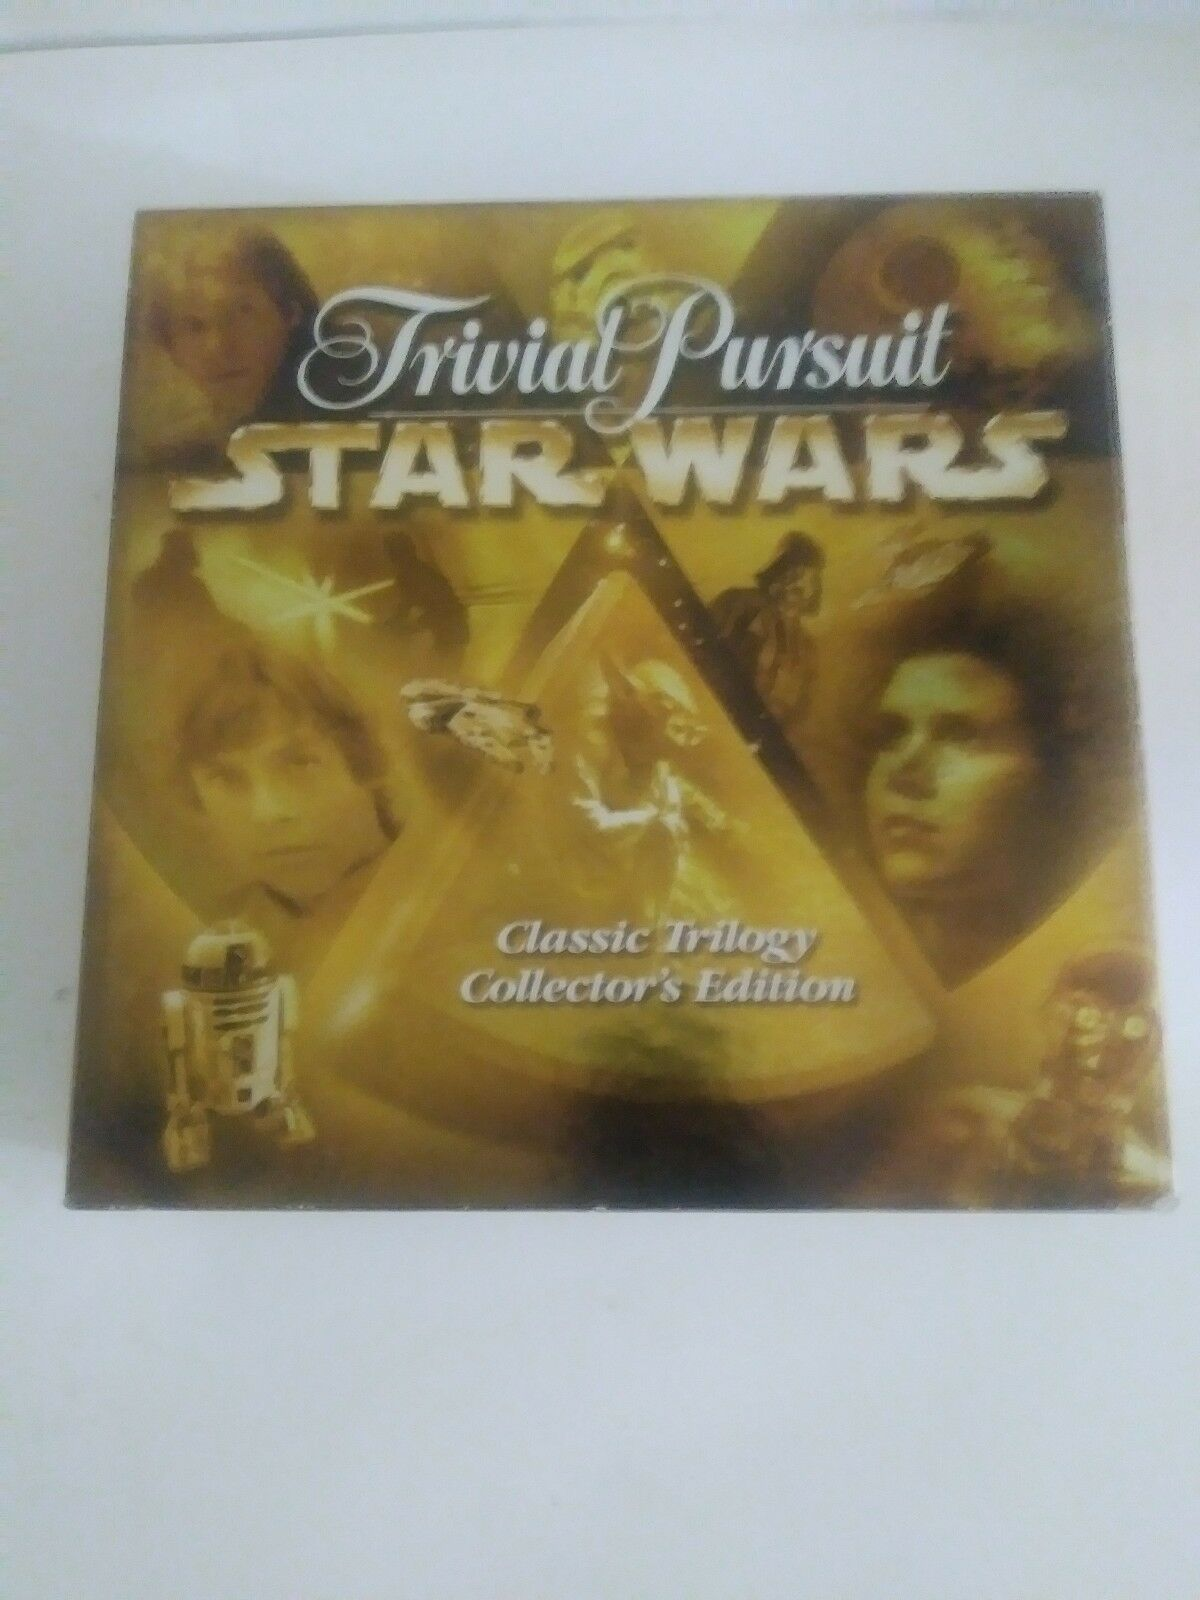 Star Wars Trivial Pursuit Classic Trilogy Collectors Edition, 1997